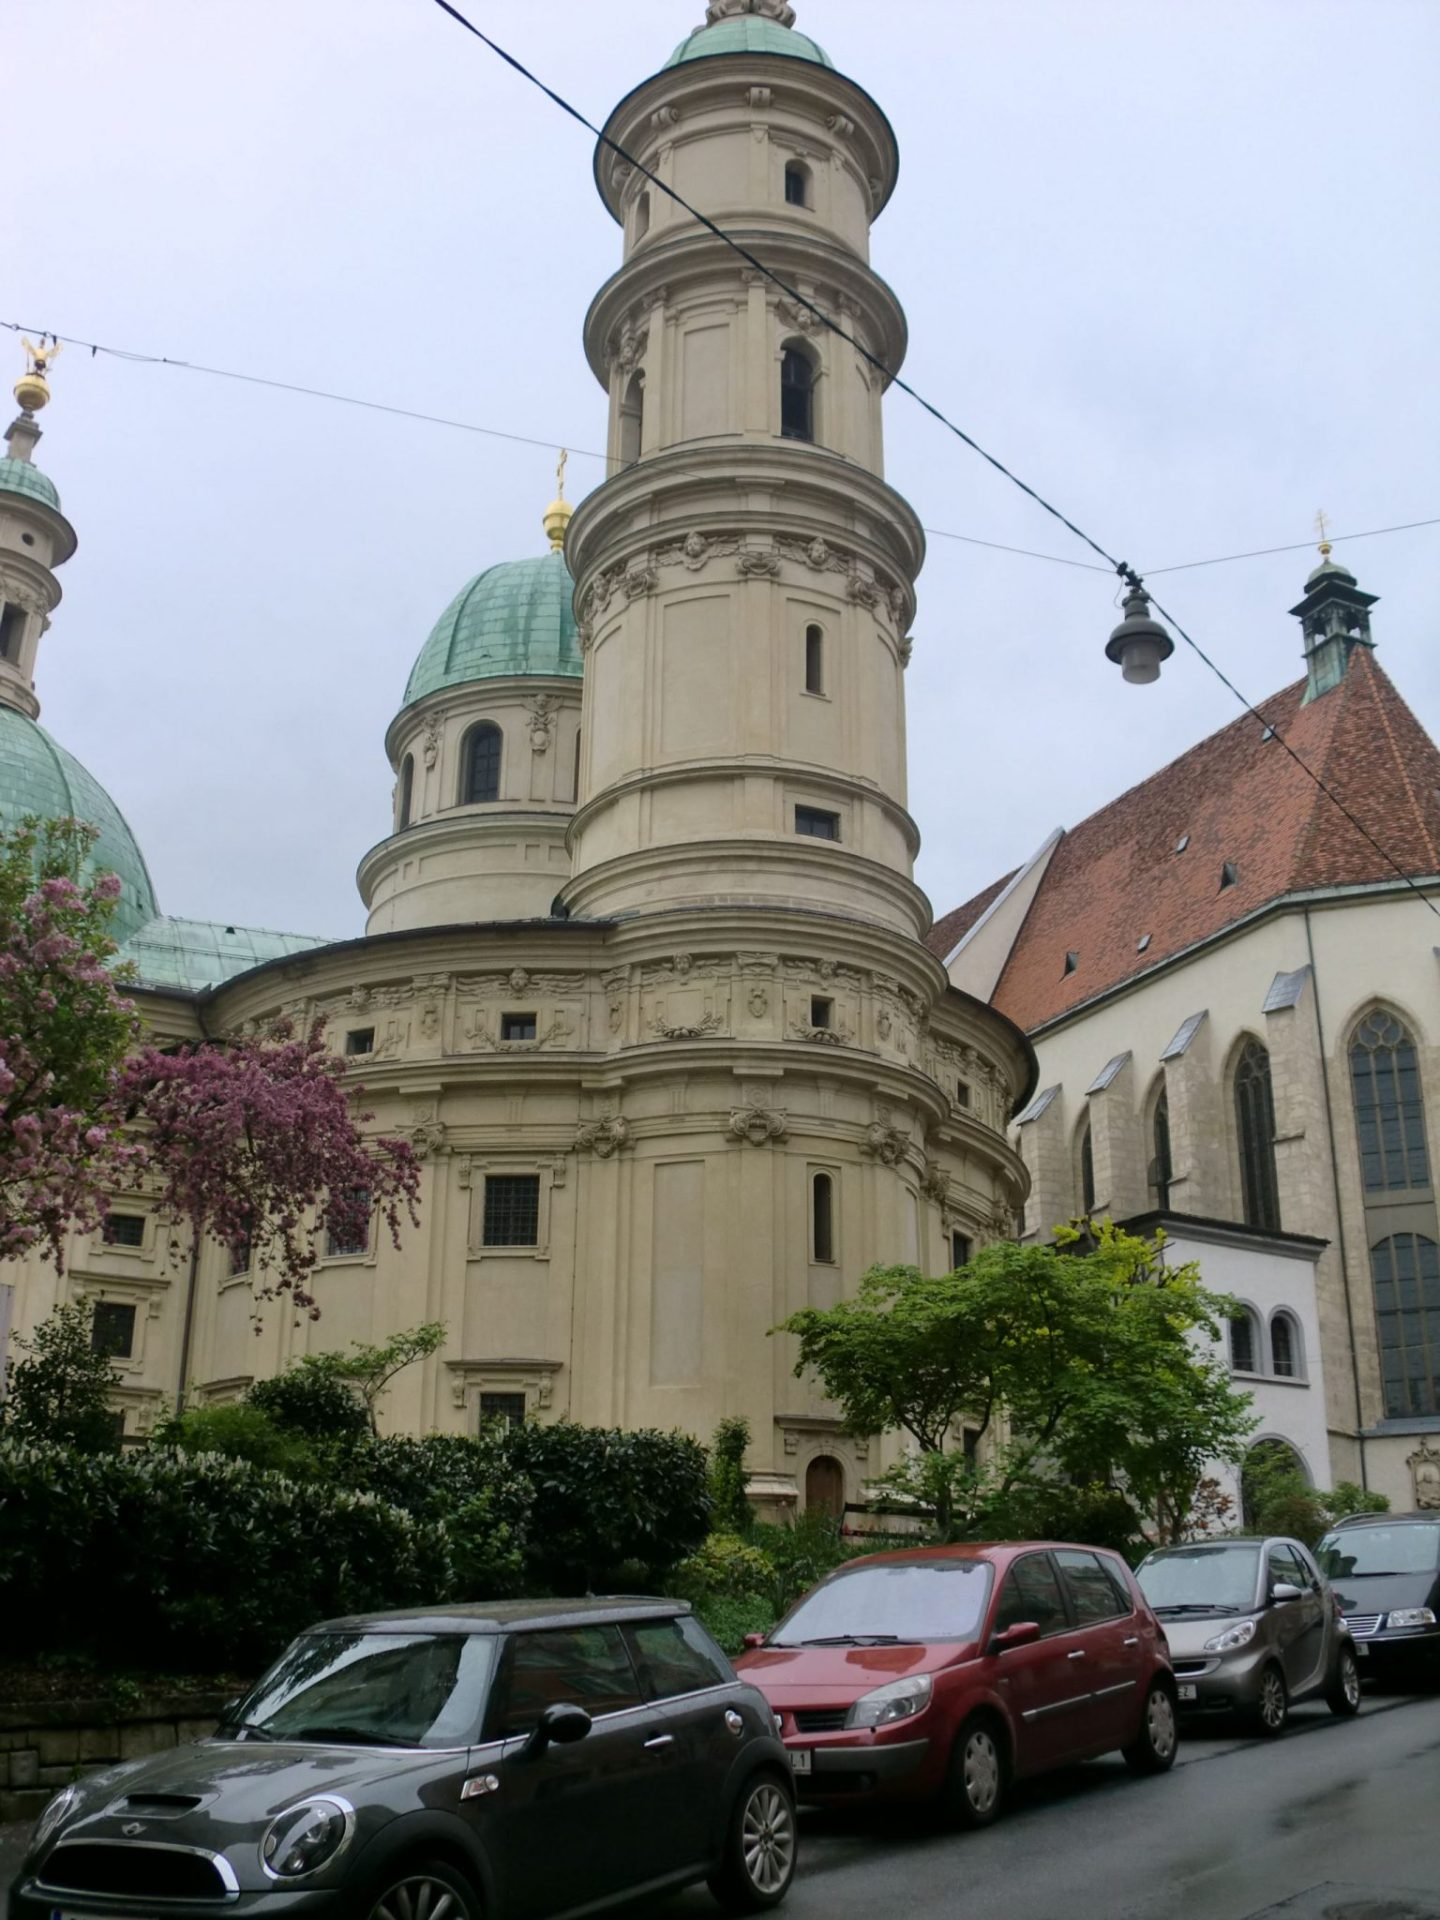 Graz church 0 - Graz: tradition and modernity